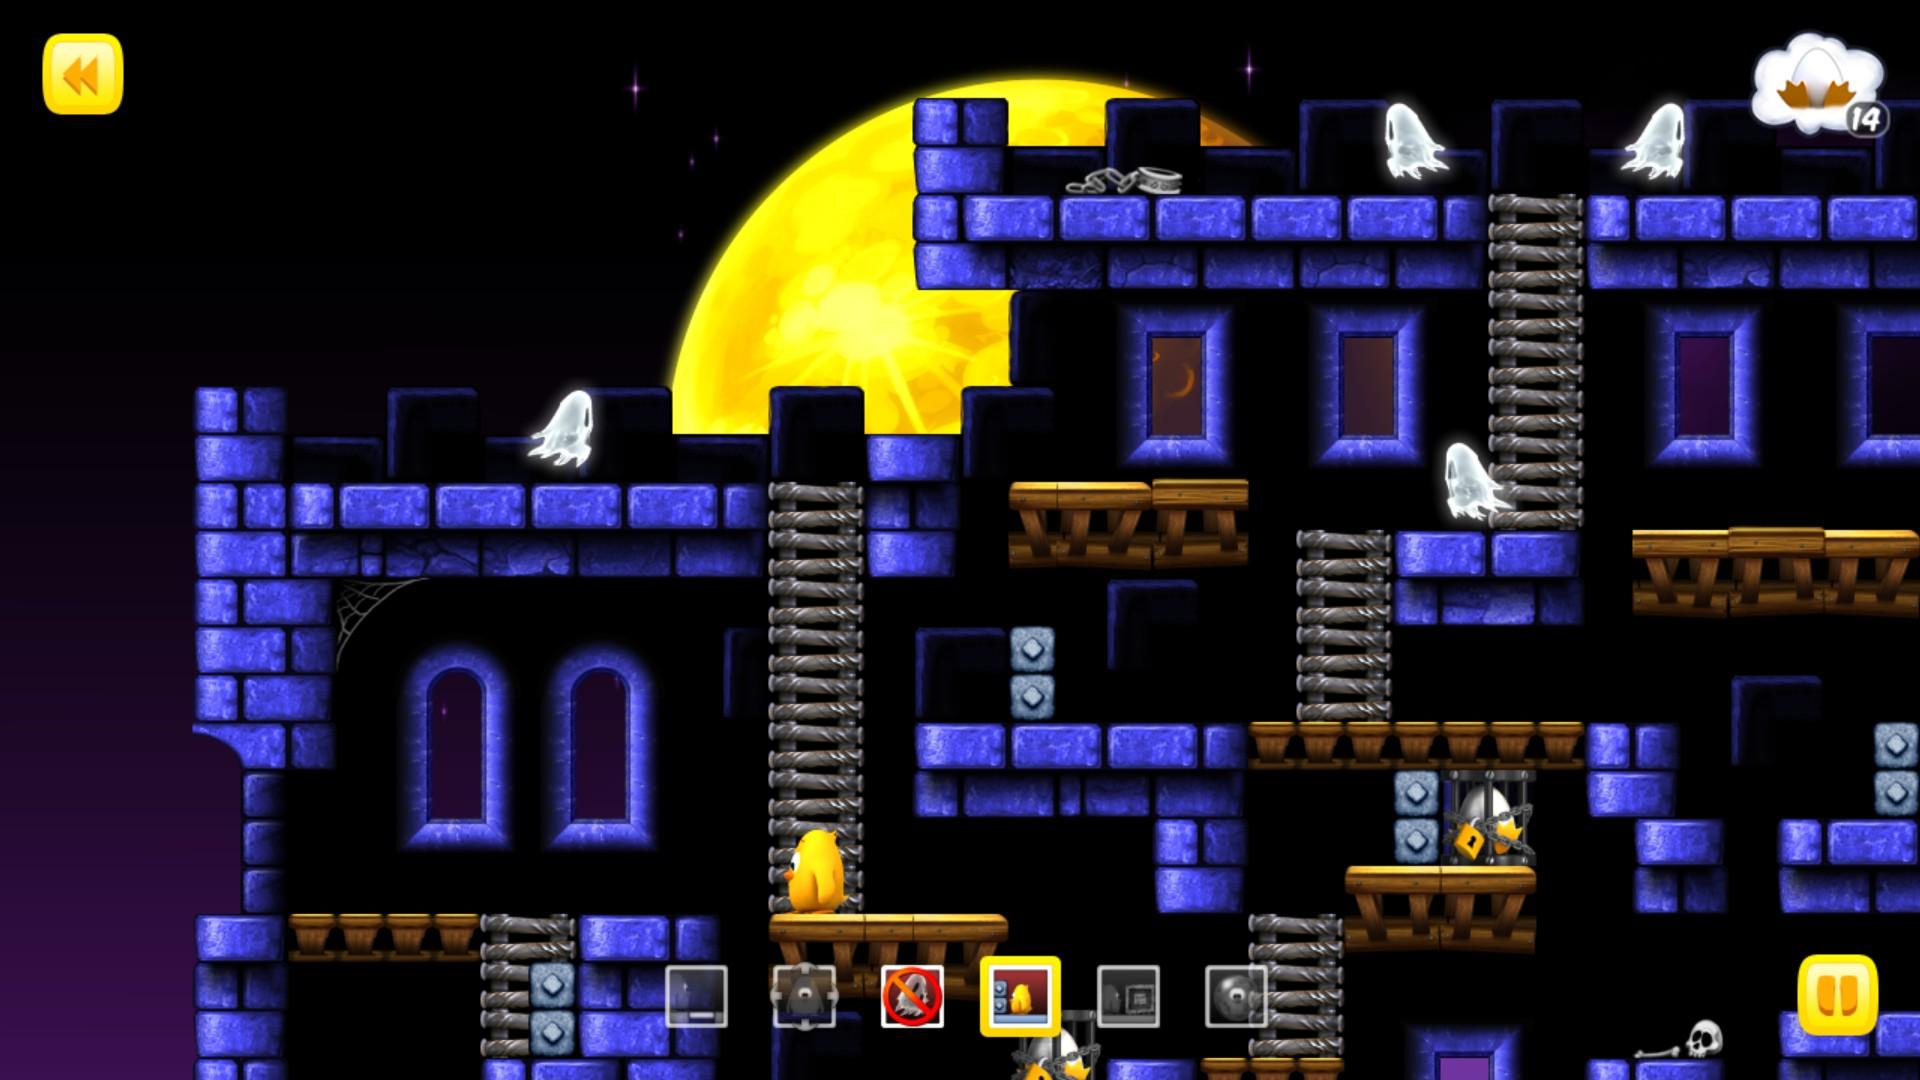 TokiTori Phantom Conundrum Screenshot